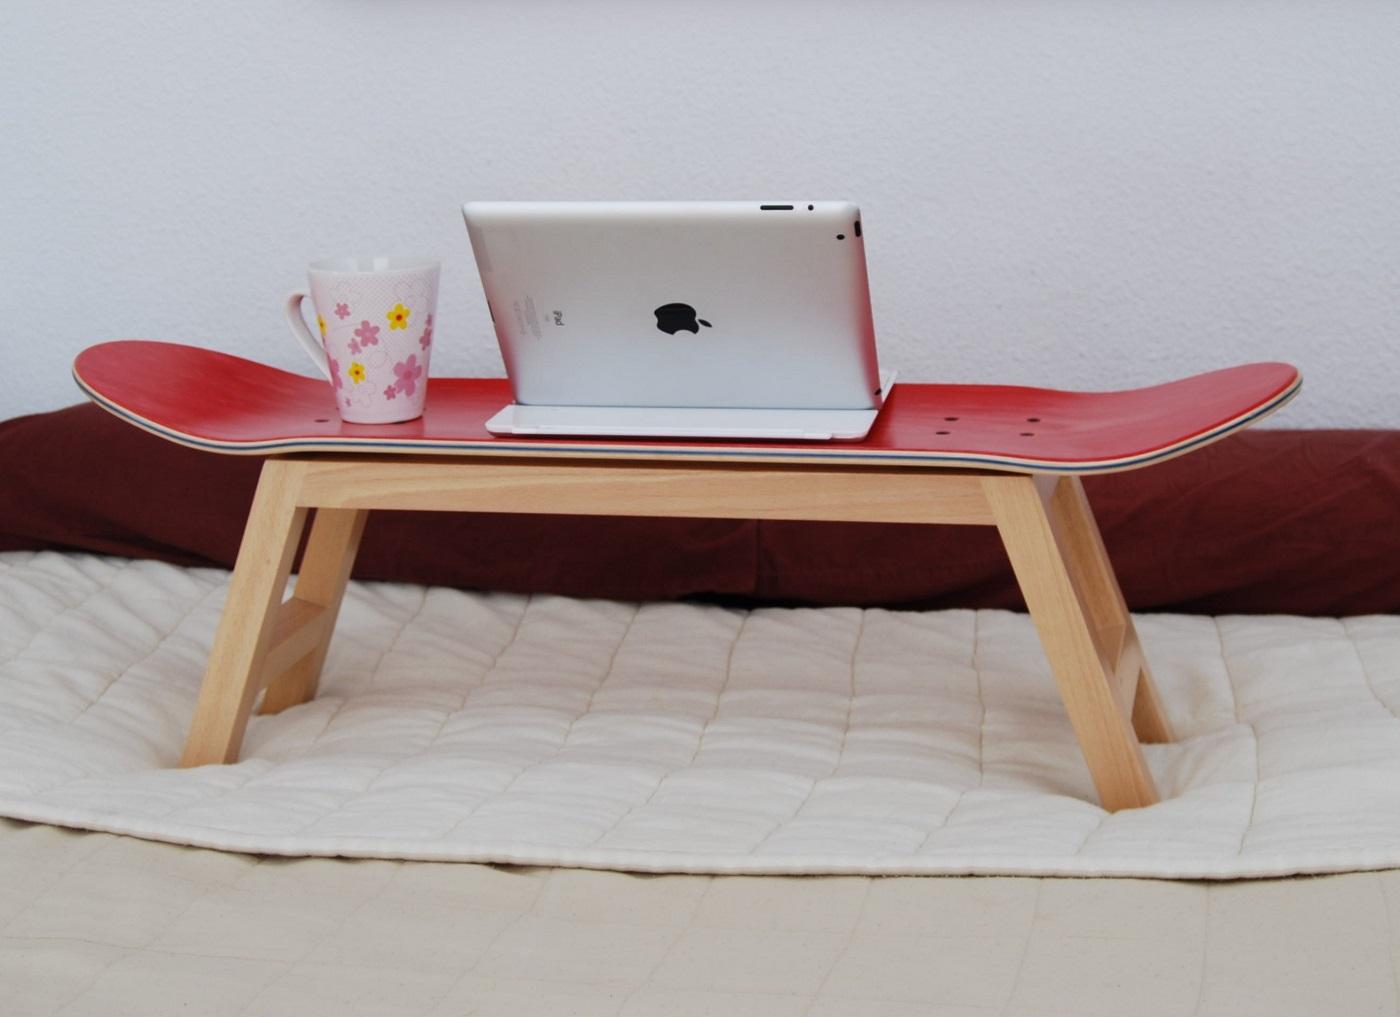 Skateboard Bedroom Furniture Skate Home Skateboard Decor In Your House Games Kids Bedroom